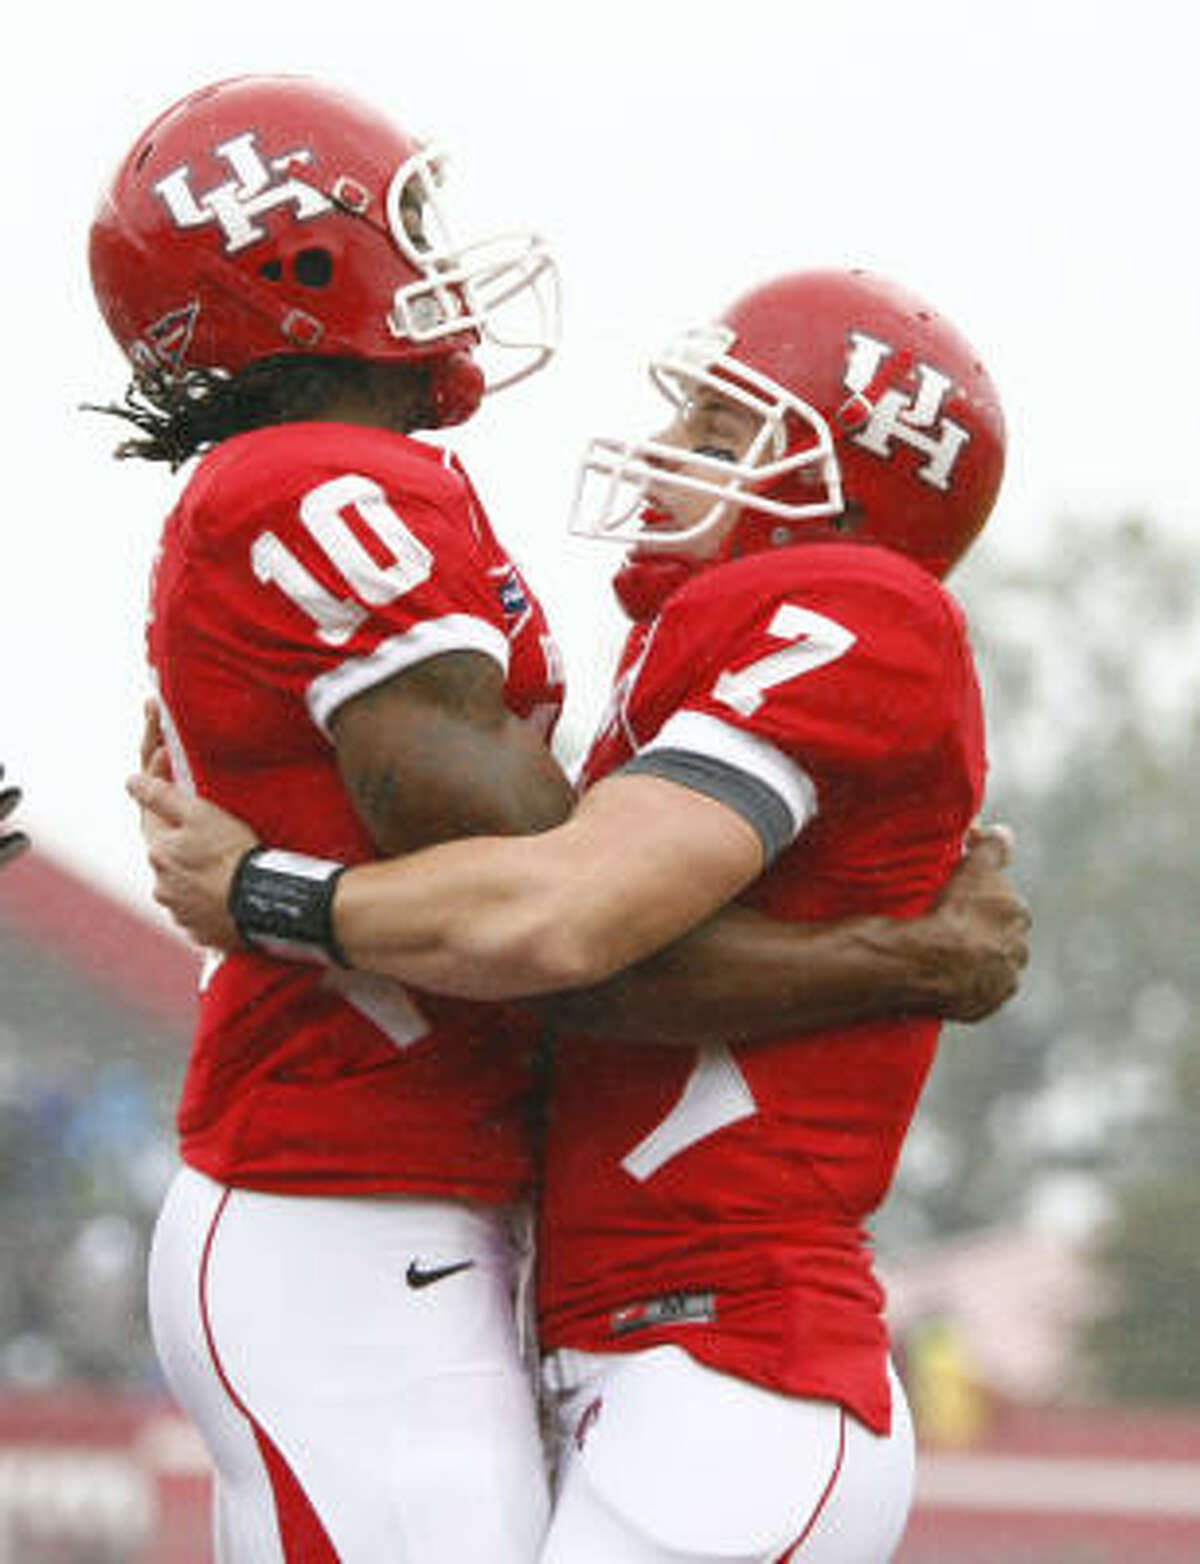 Houston receiver L.J. Castile, left, gets a hug from quarterback Case Keenum after a touchdown.